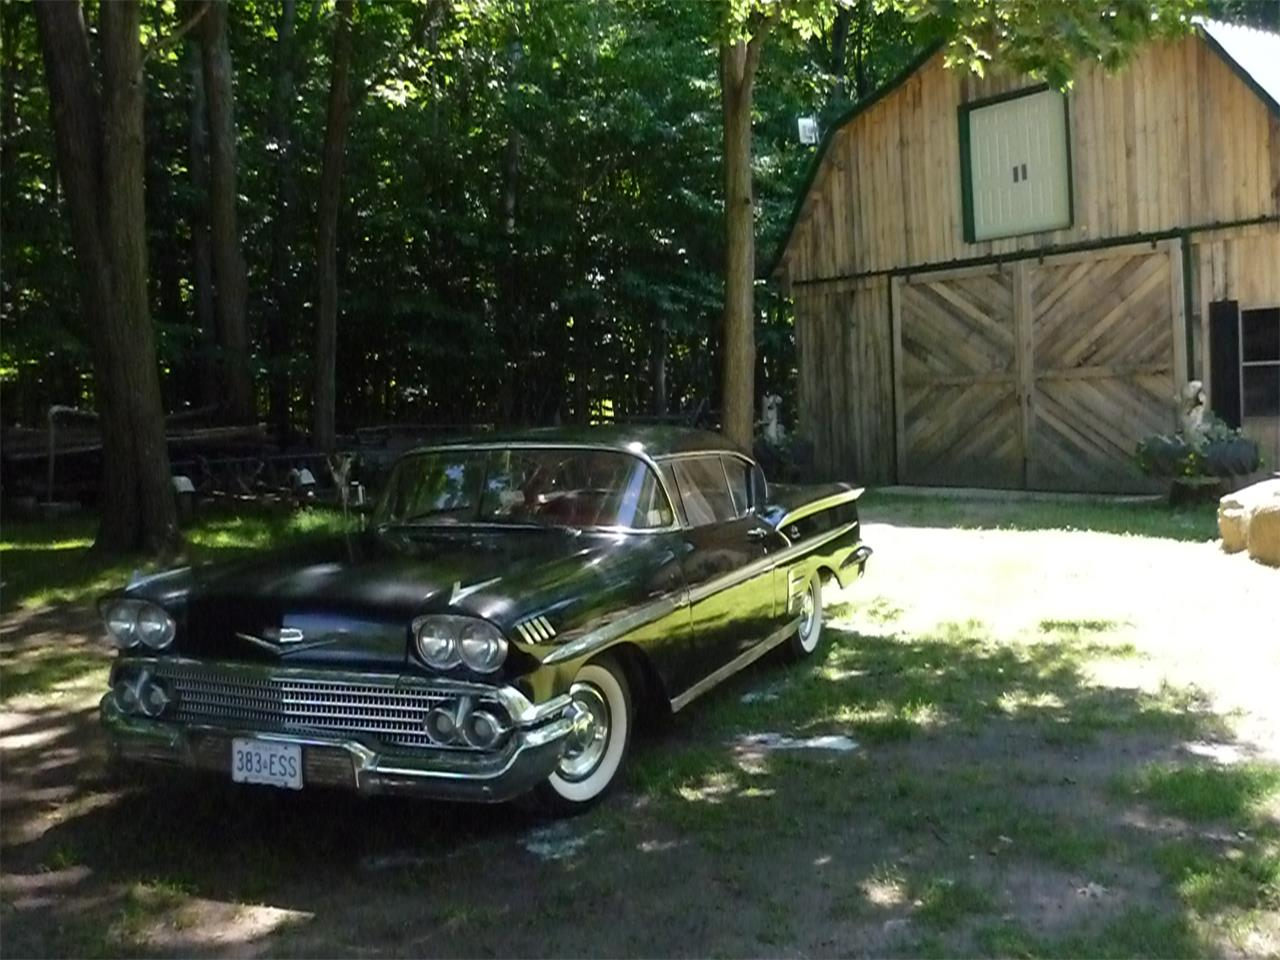 For Sale 1958 Chevrolet Impala In Perth Ontario